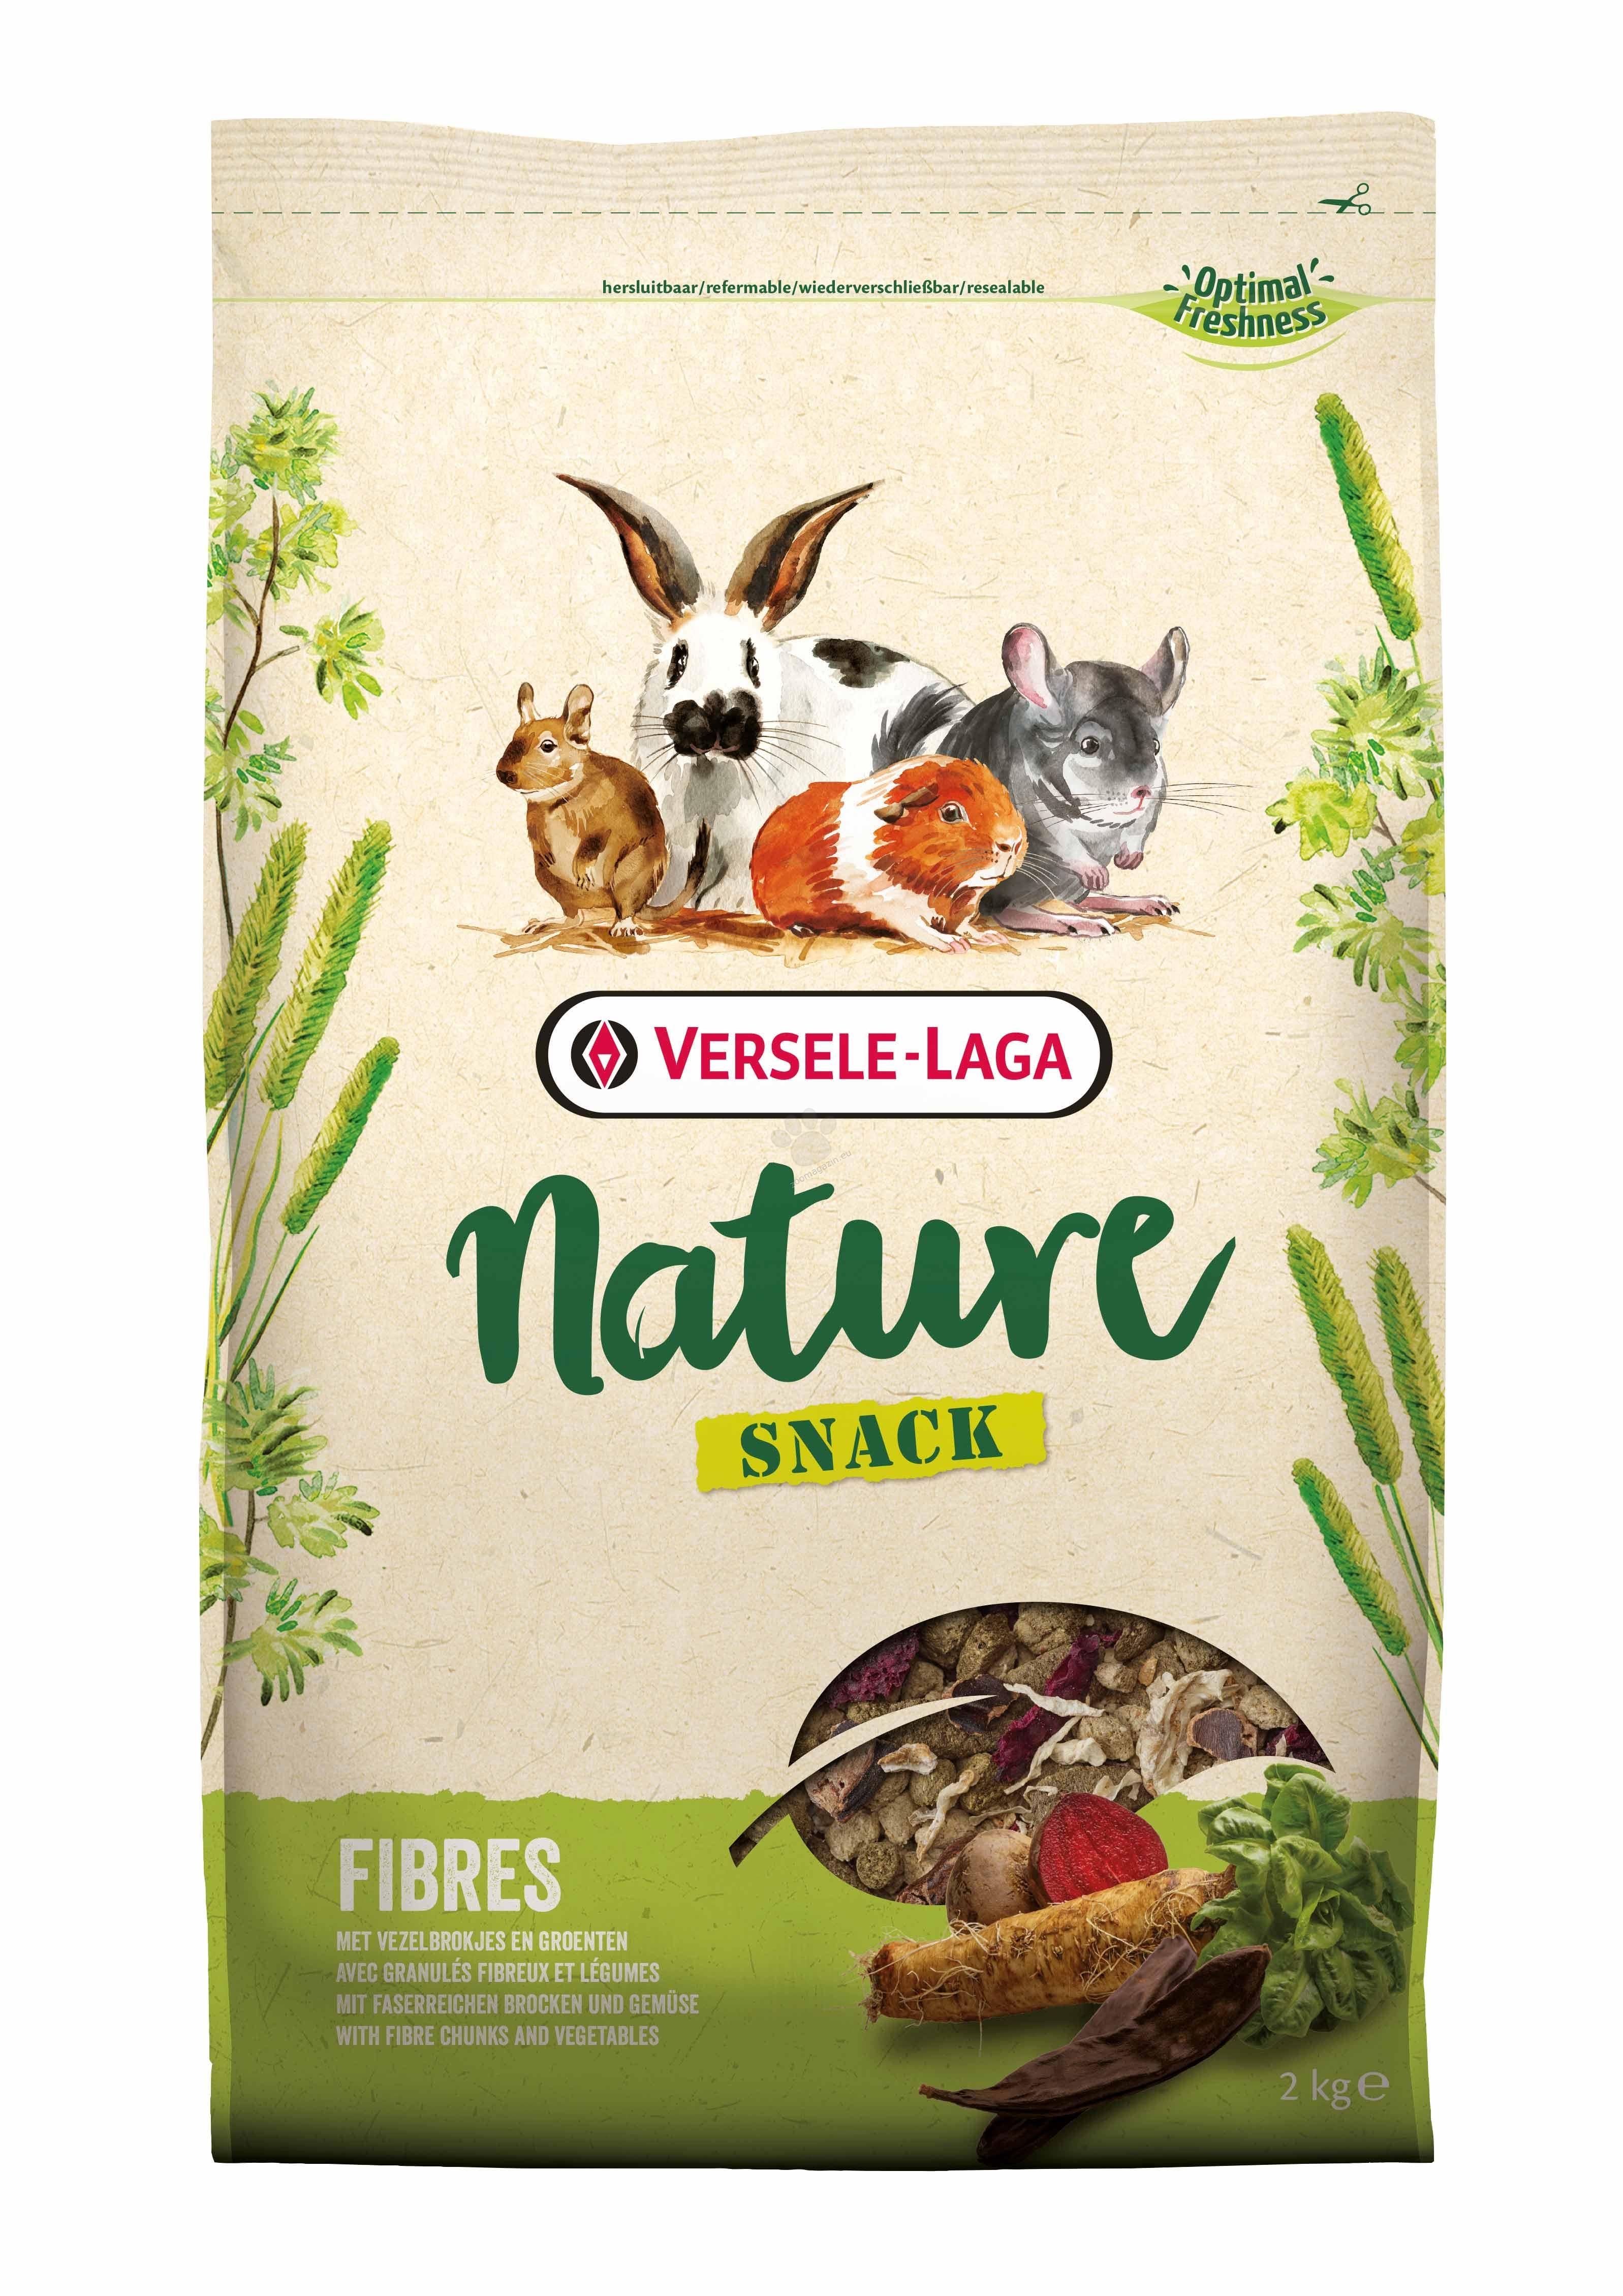 Versele Laga - Nature Snack Fibers - разнообразна фибри закуска 2 кг.